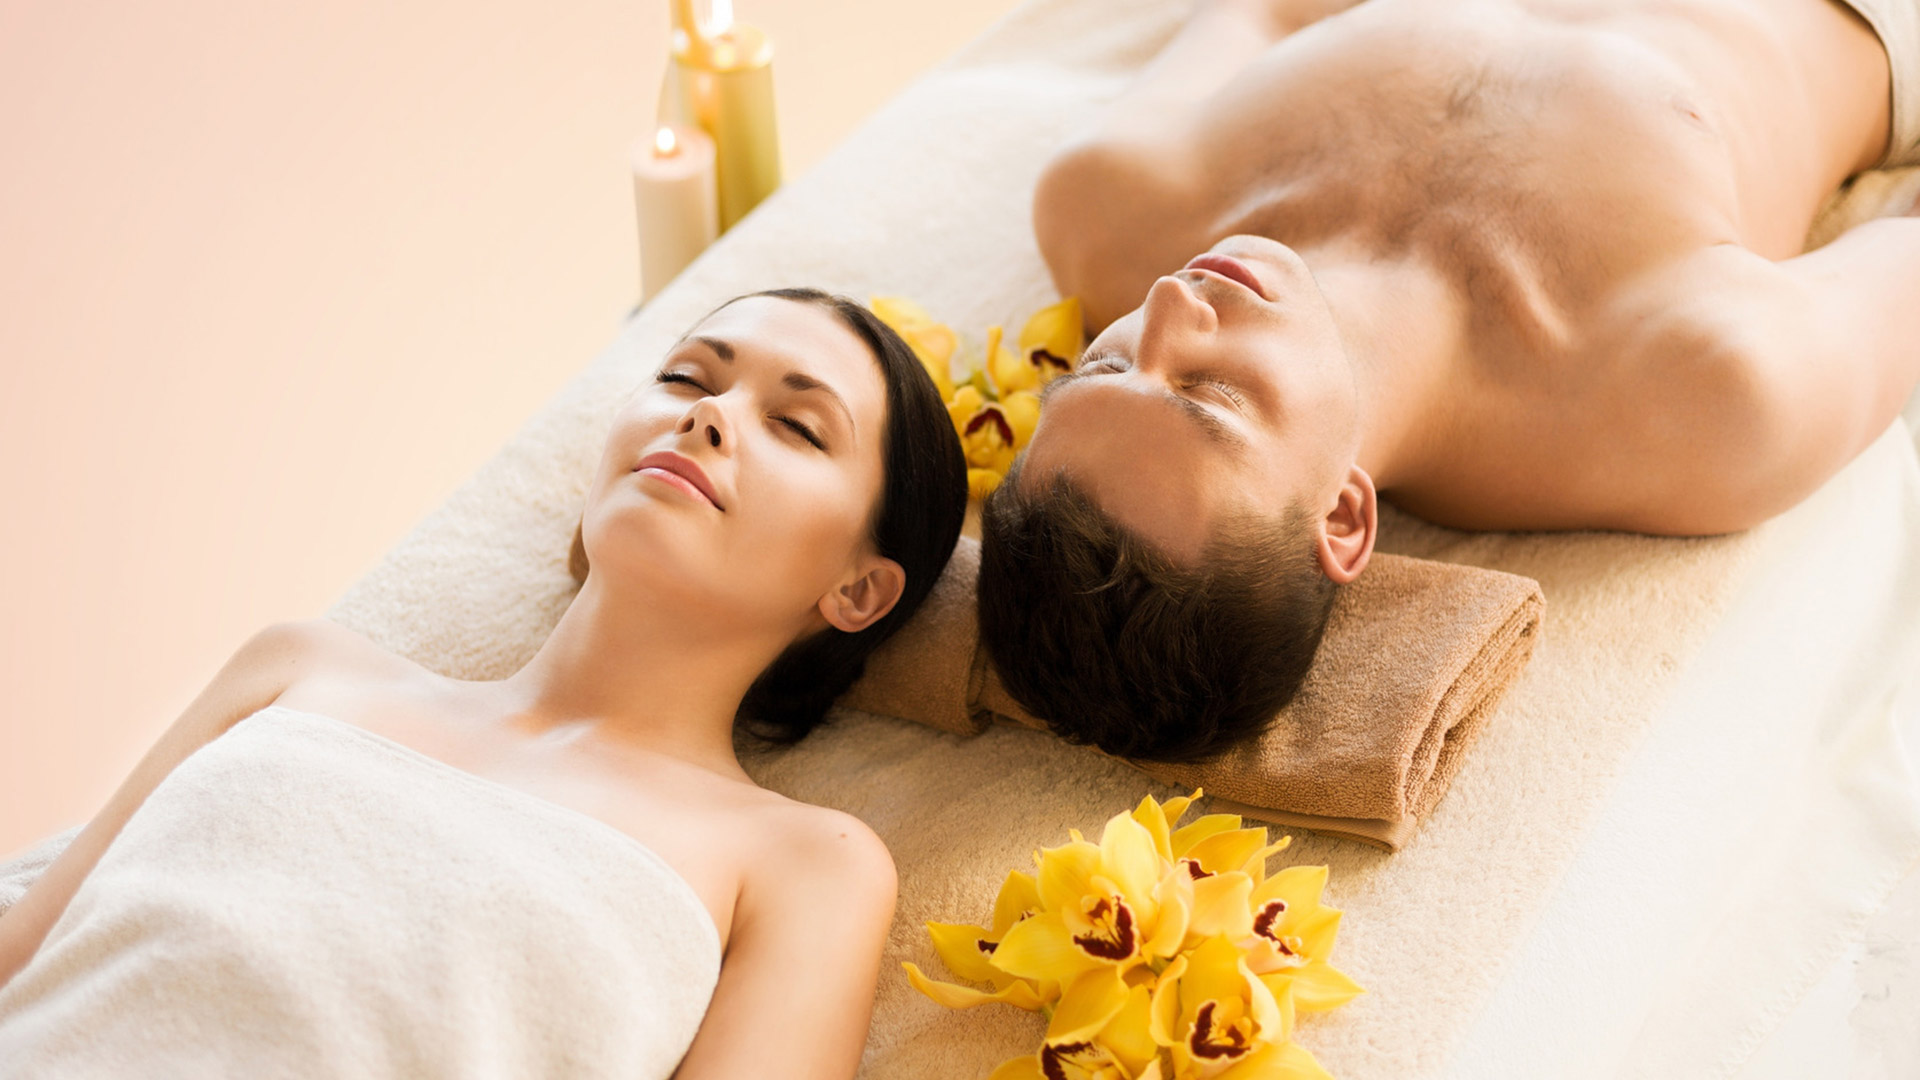 Massage therapist study